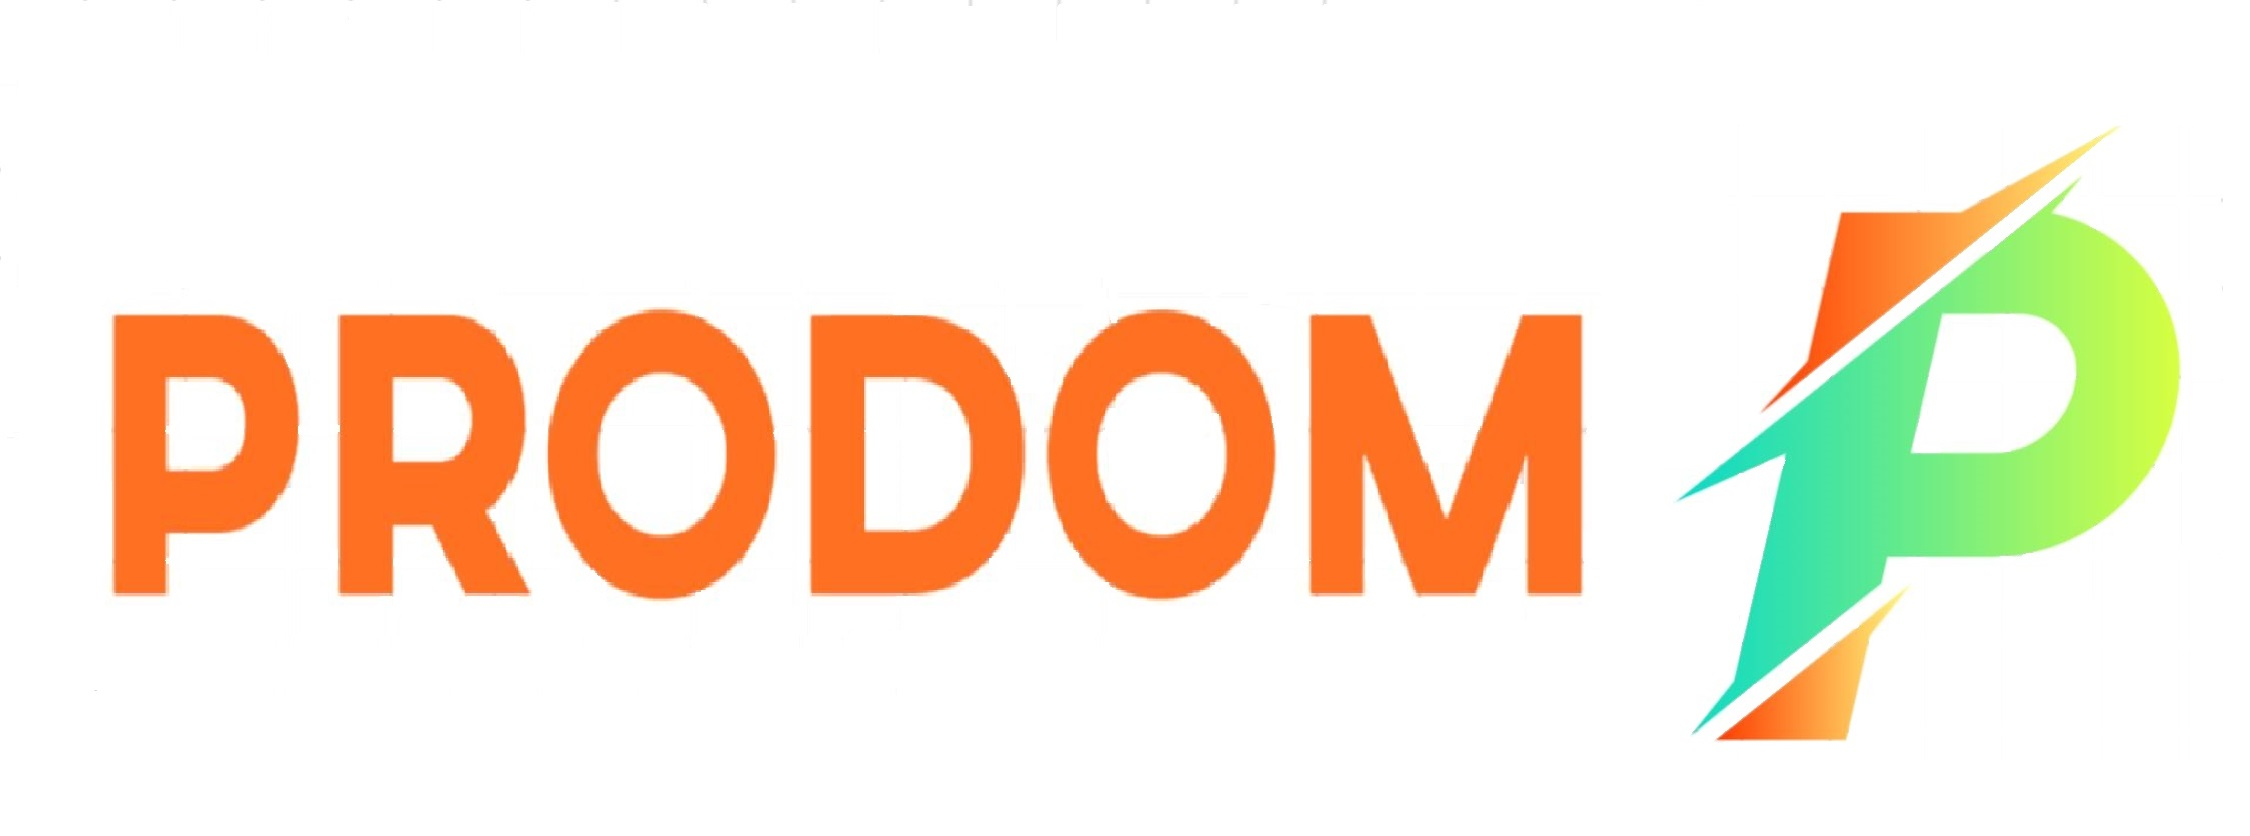 Prodom